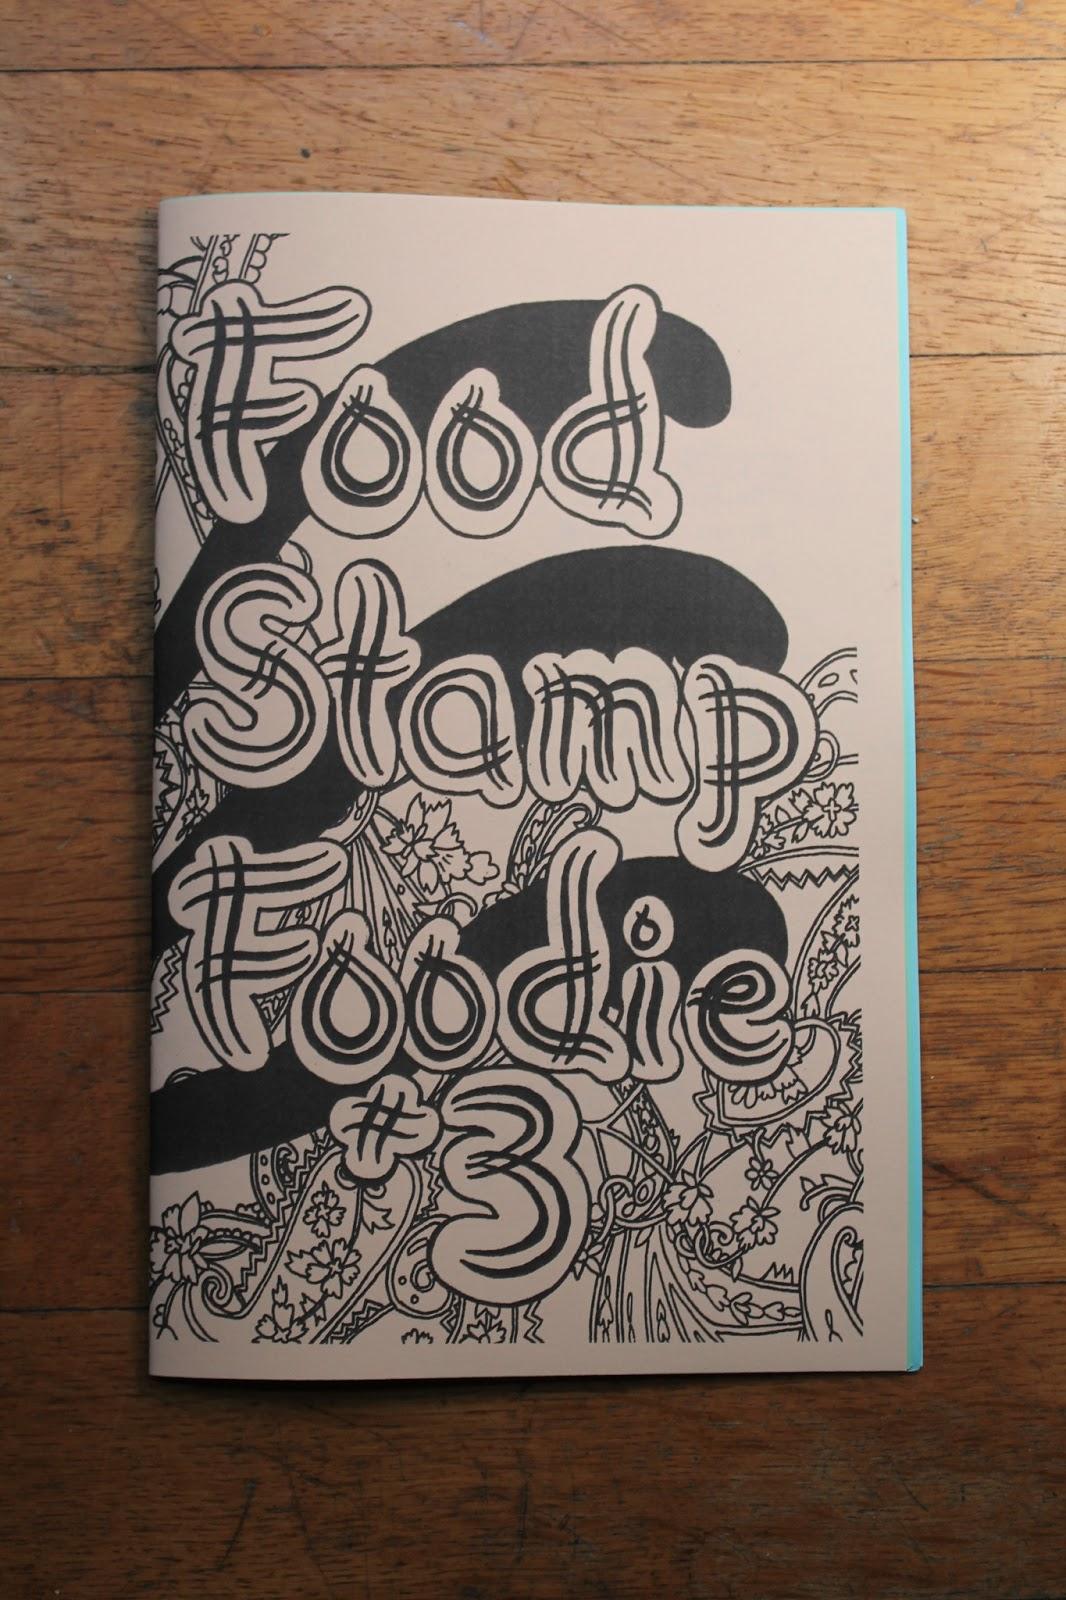 foodstampfoodie3